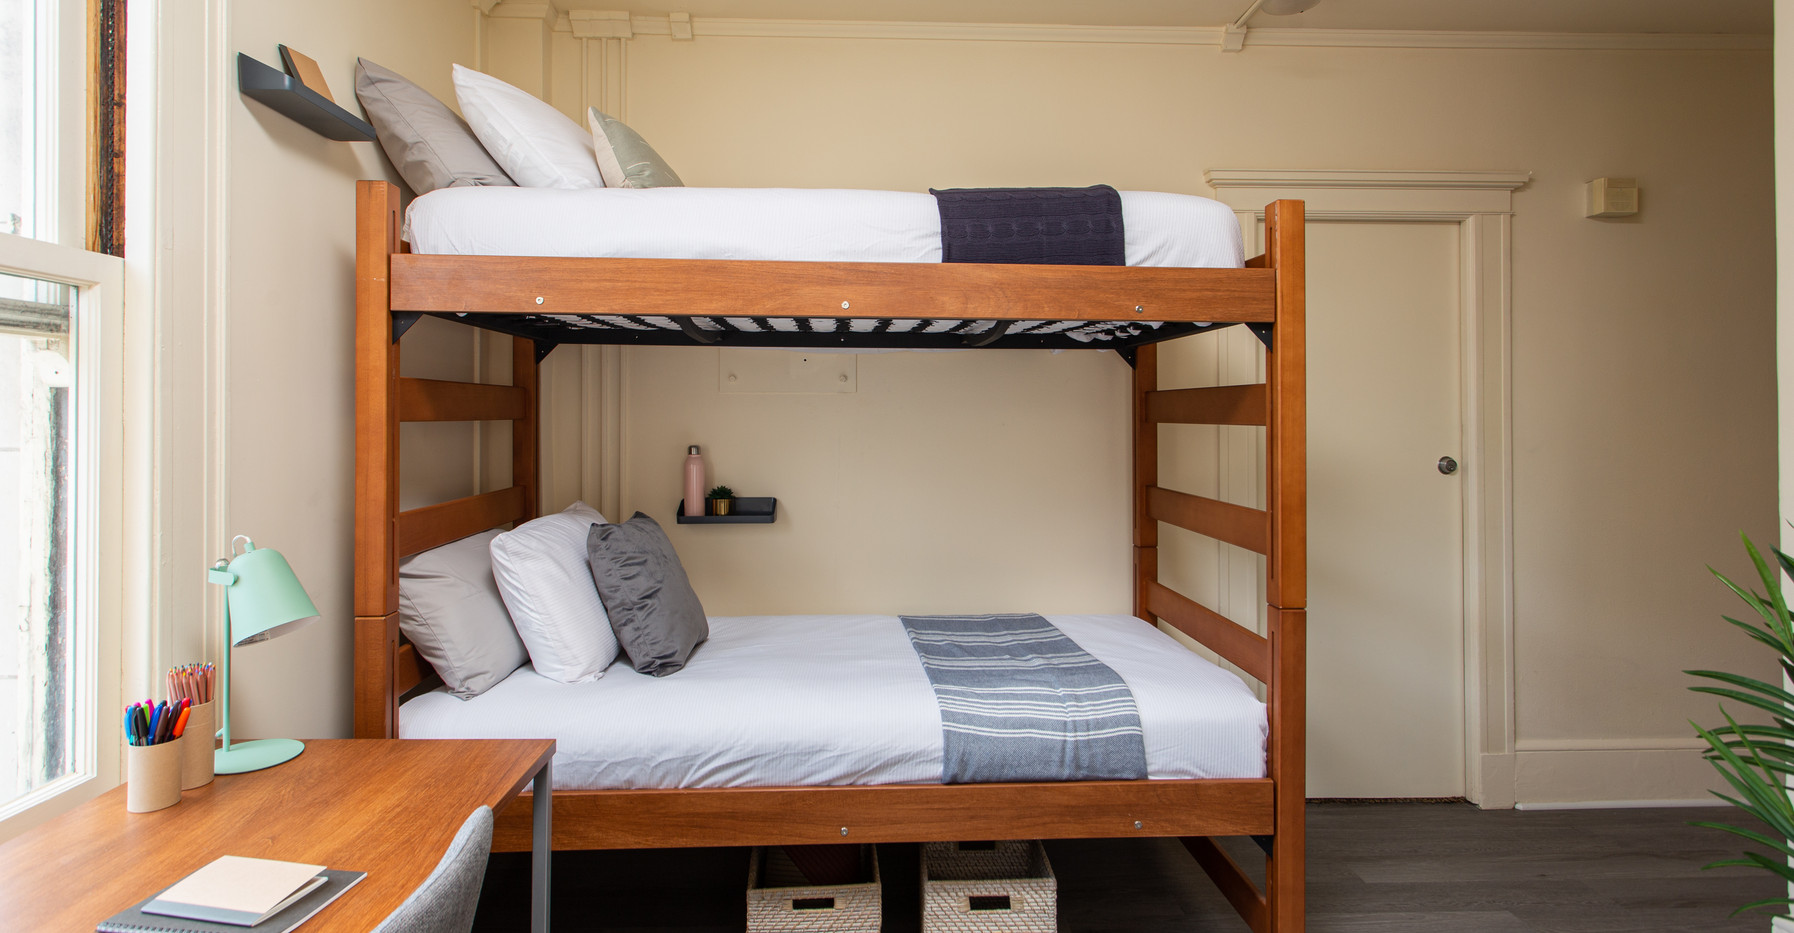 San Francisco student room 8